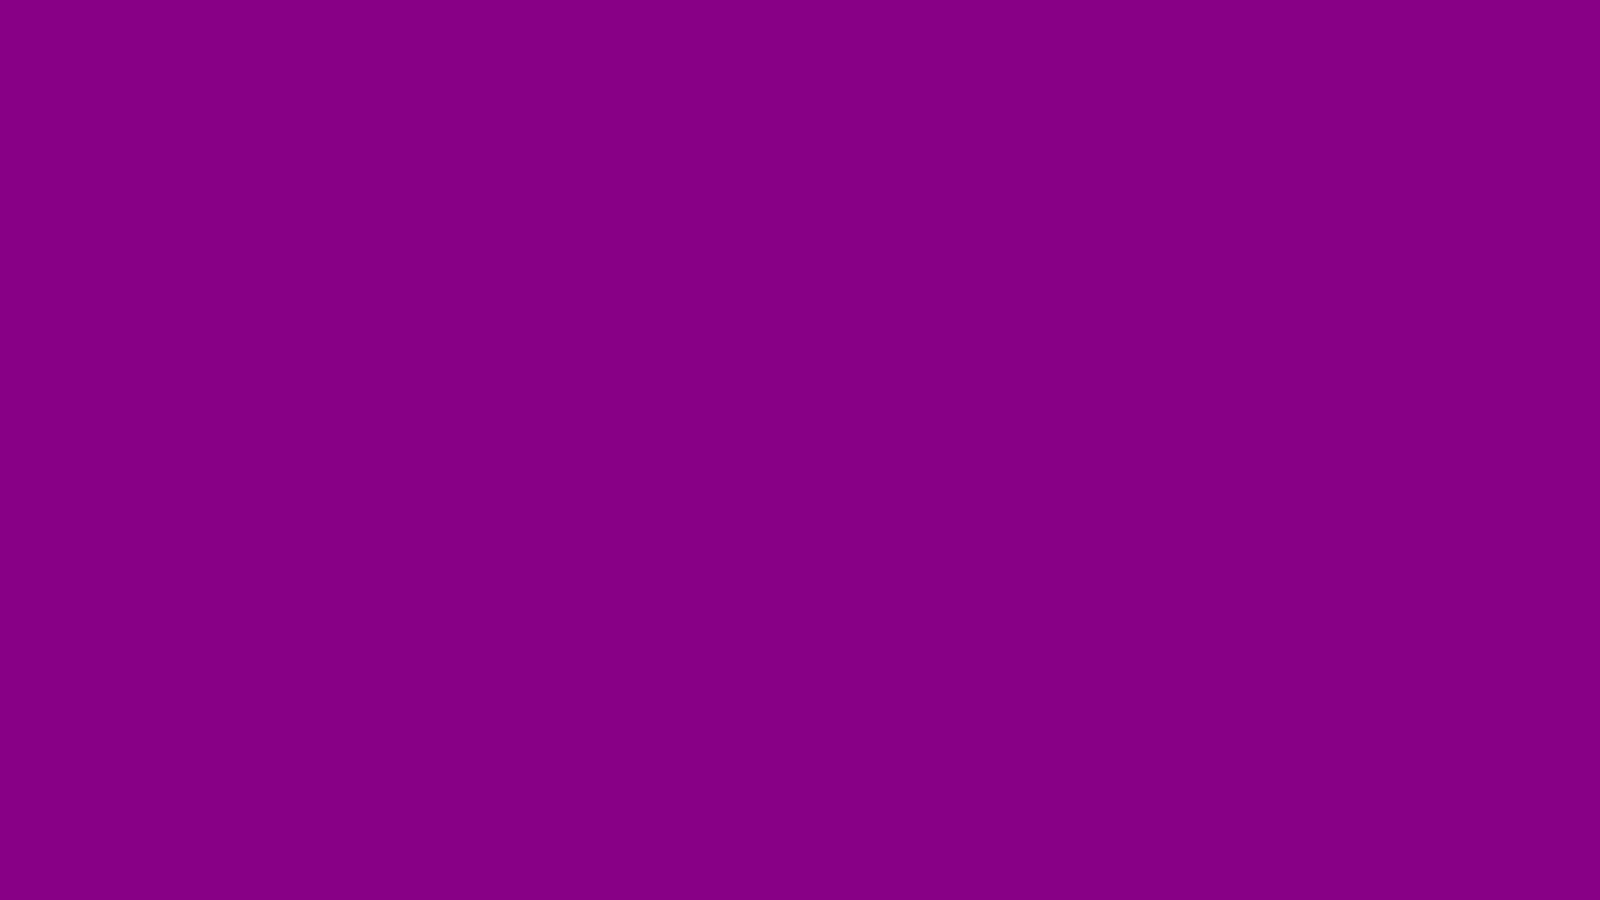 1600x900 Mardi Gras Solid Color Background